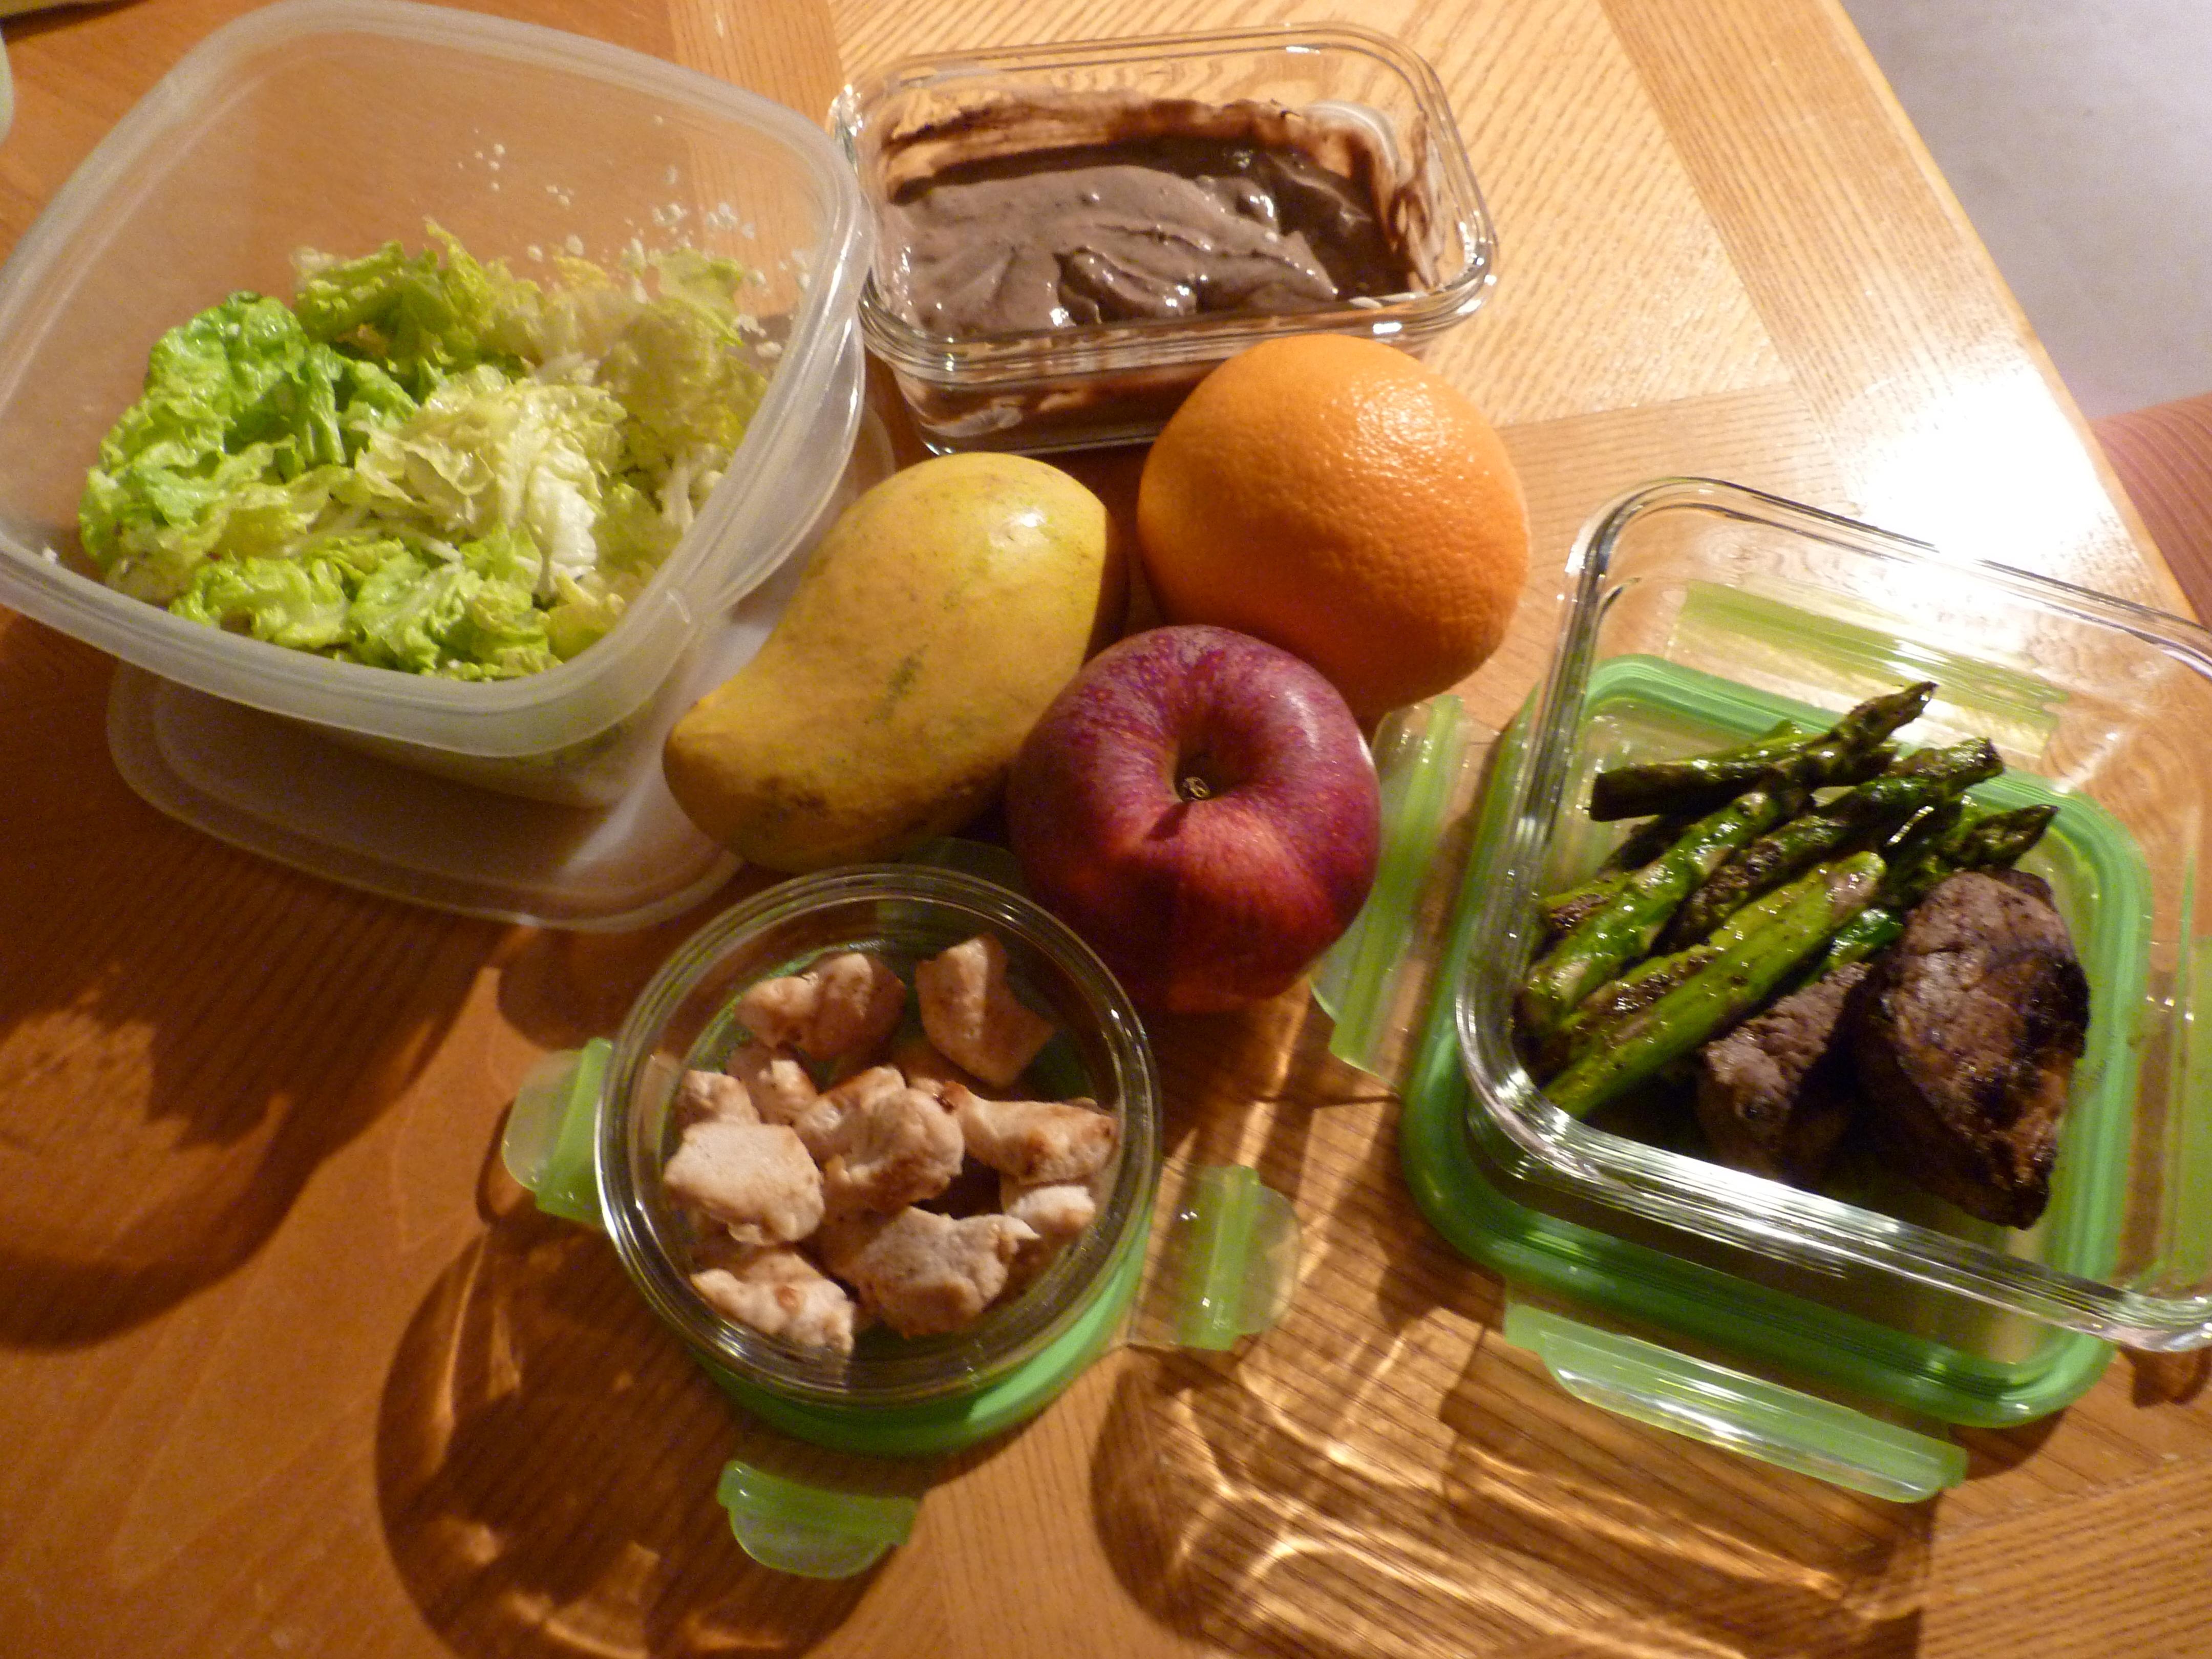 Green tea hawaii weight loss reviews